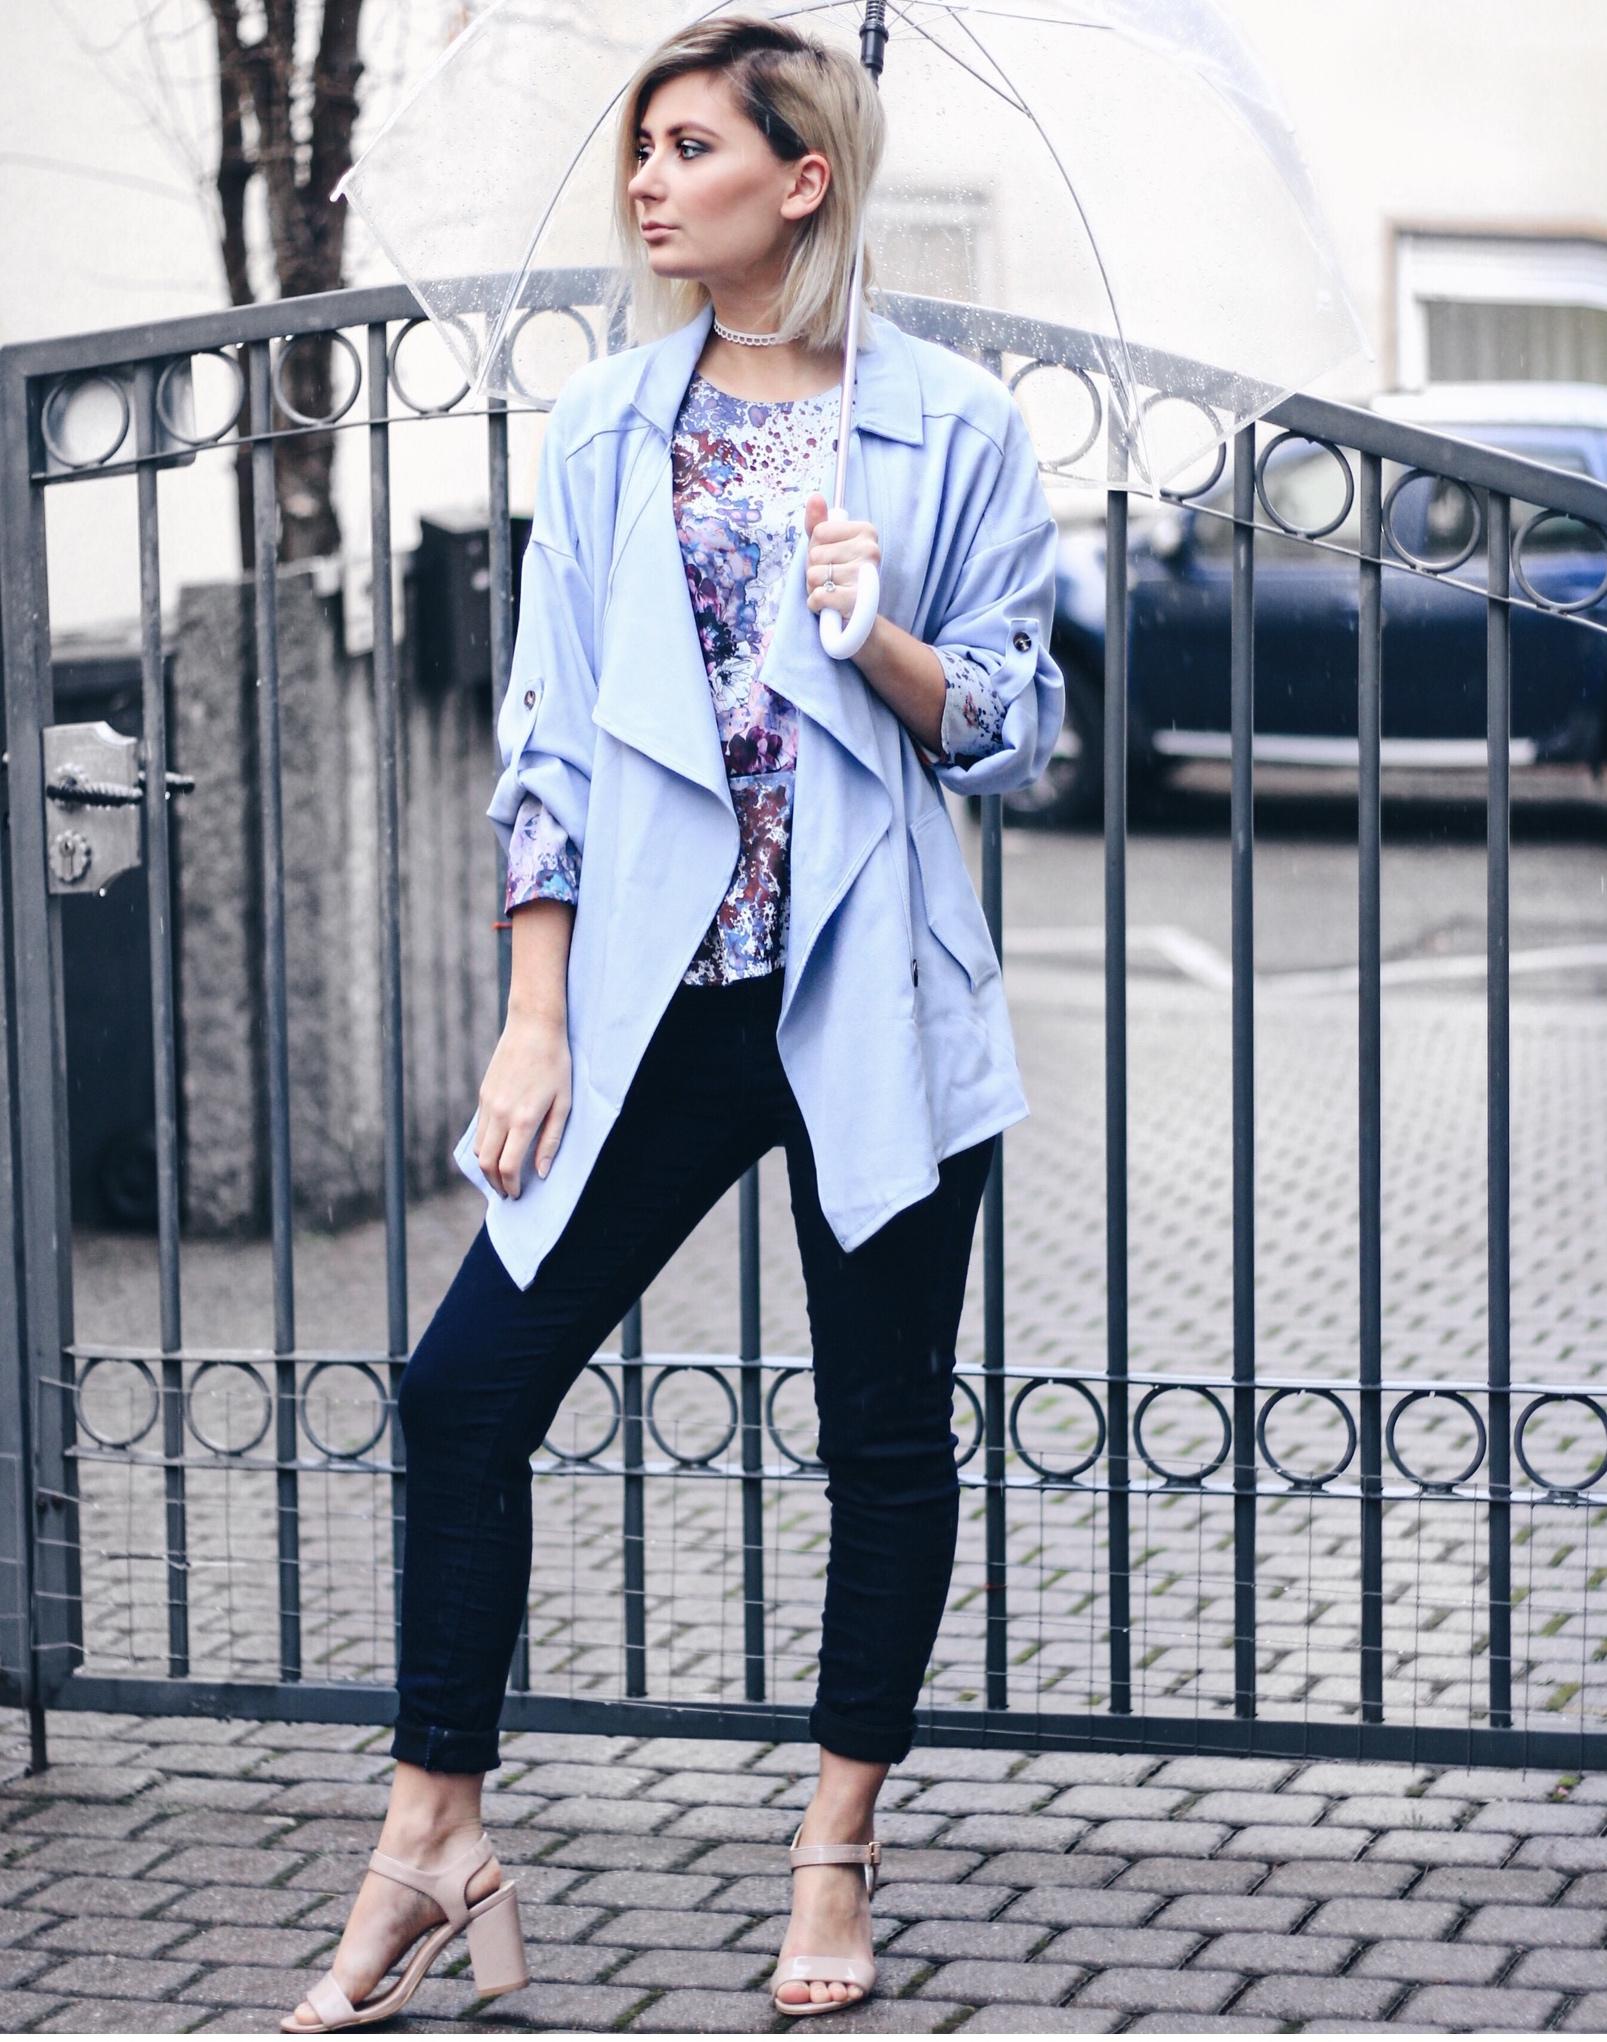 outfit, ootd, fashionblog, modeblog, fashionblogger, gleichberechtigung, feminismus, sexismus, pastell, kolumne, fashionista, trend frühling 2017